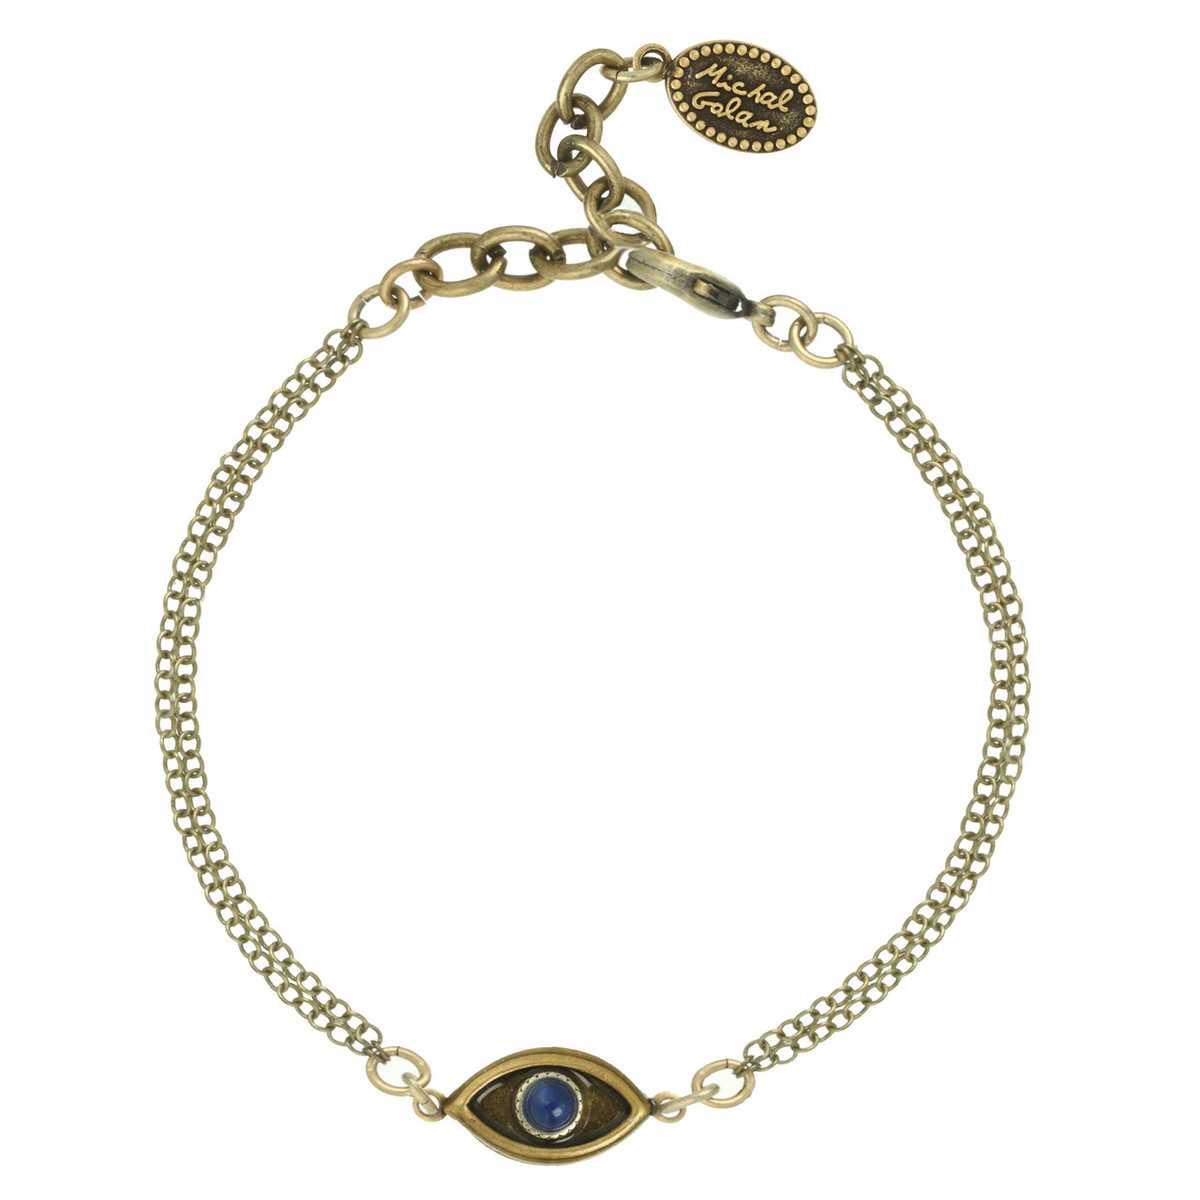 Gold Michal Golan Jewelry Evil Eye with Lapiz Center Bracelet